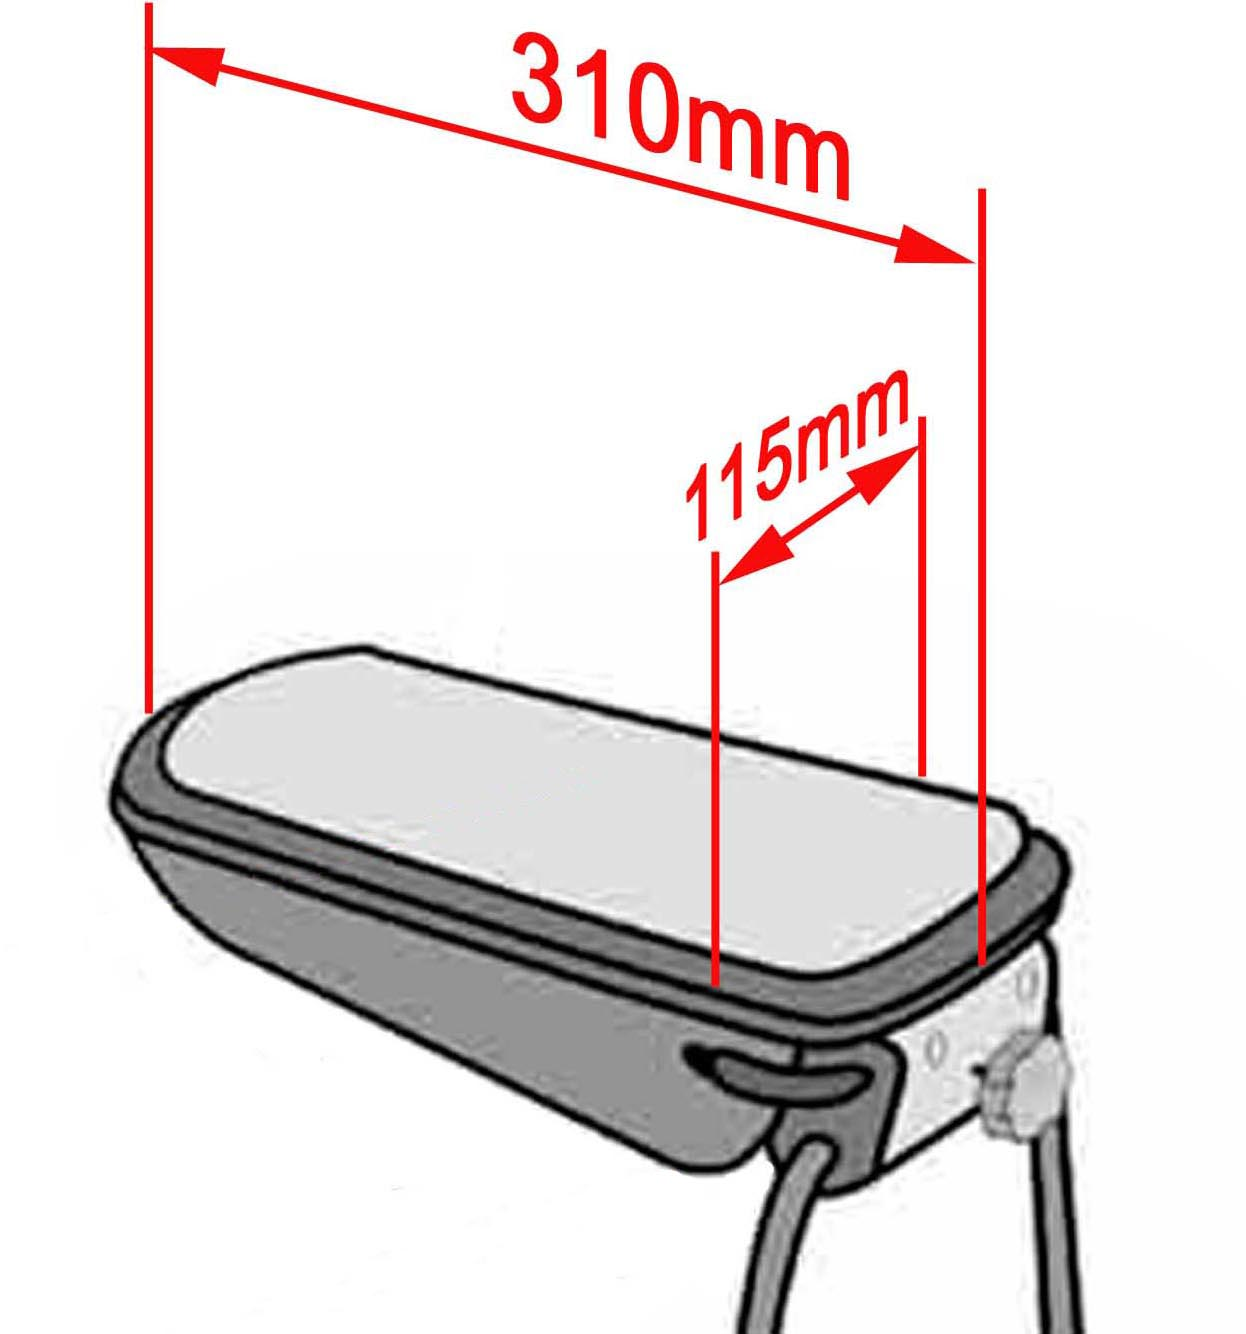 mittelarmlehne hyundai i30 stoff schwarz kamei armlehne. Black Bedroom Furniture Sets. Home Design Ideas